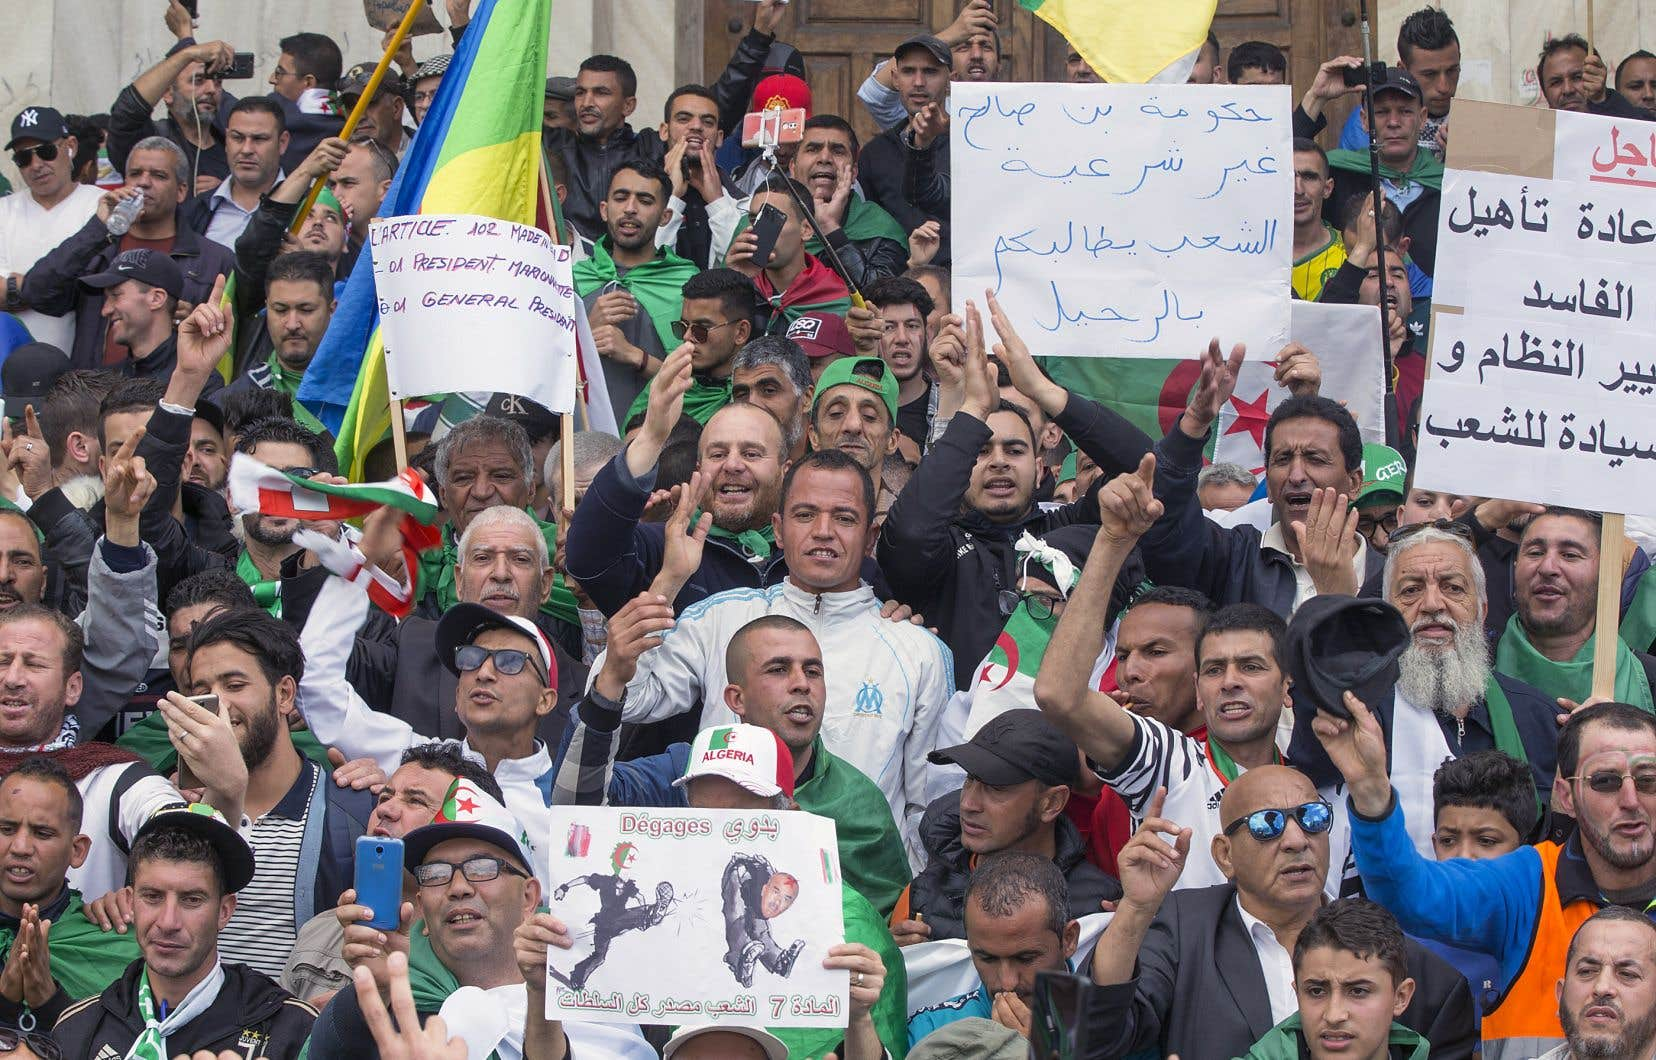 Les Algériens continuent de manifester chaque vendredi.